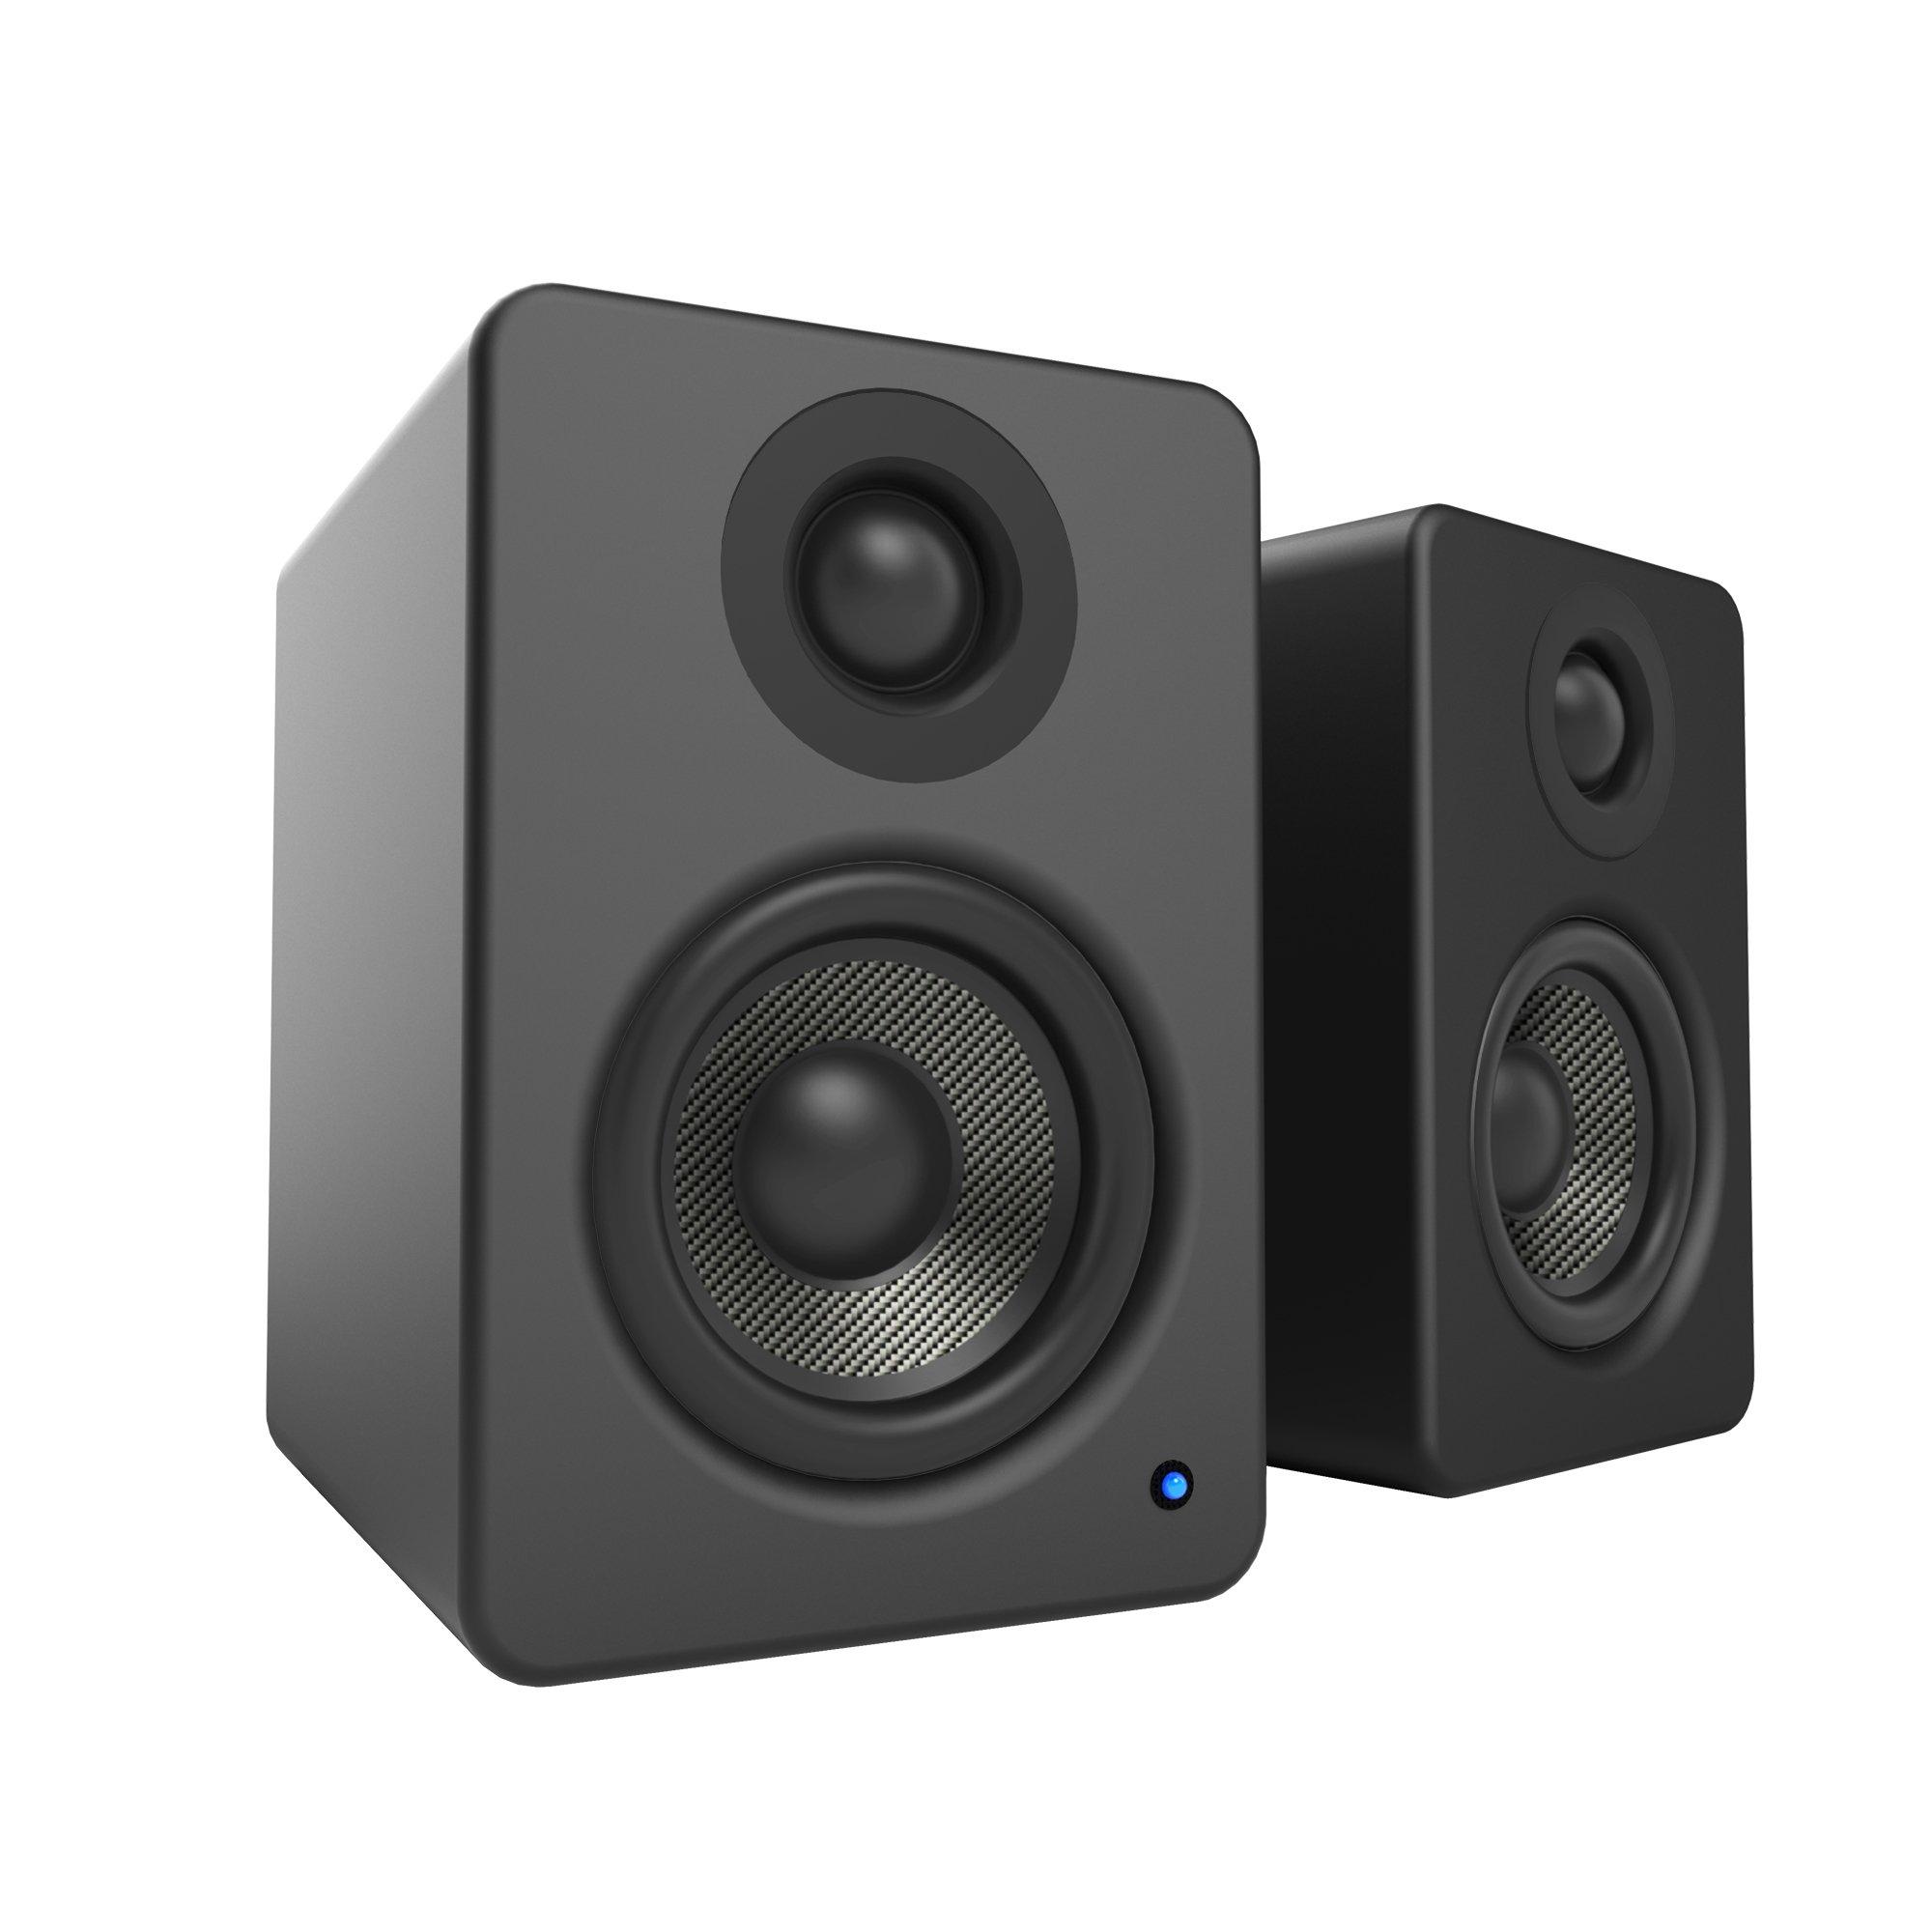 Kanto YU2 Powered Desktop Speakers – 3'' Composite Driver 3/4'' Silk Dome Tweeter – Matte Black